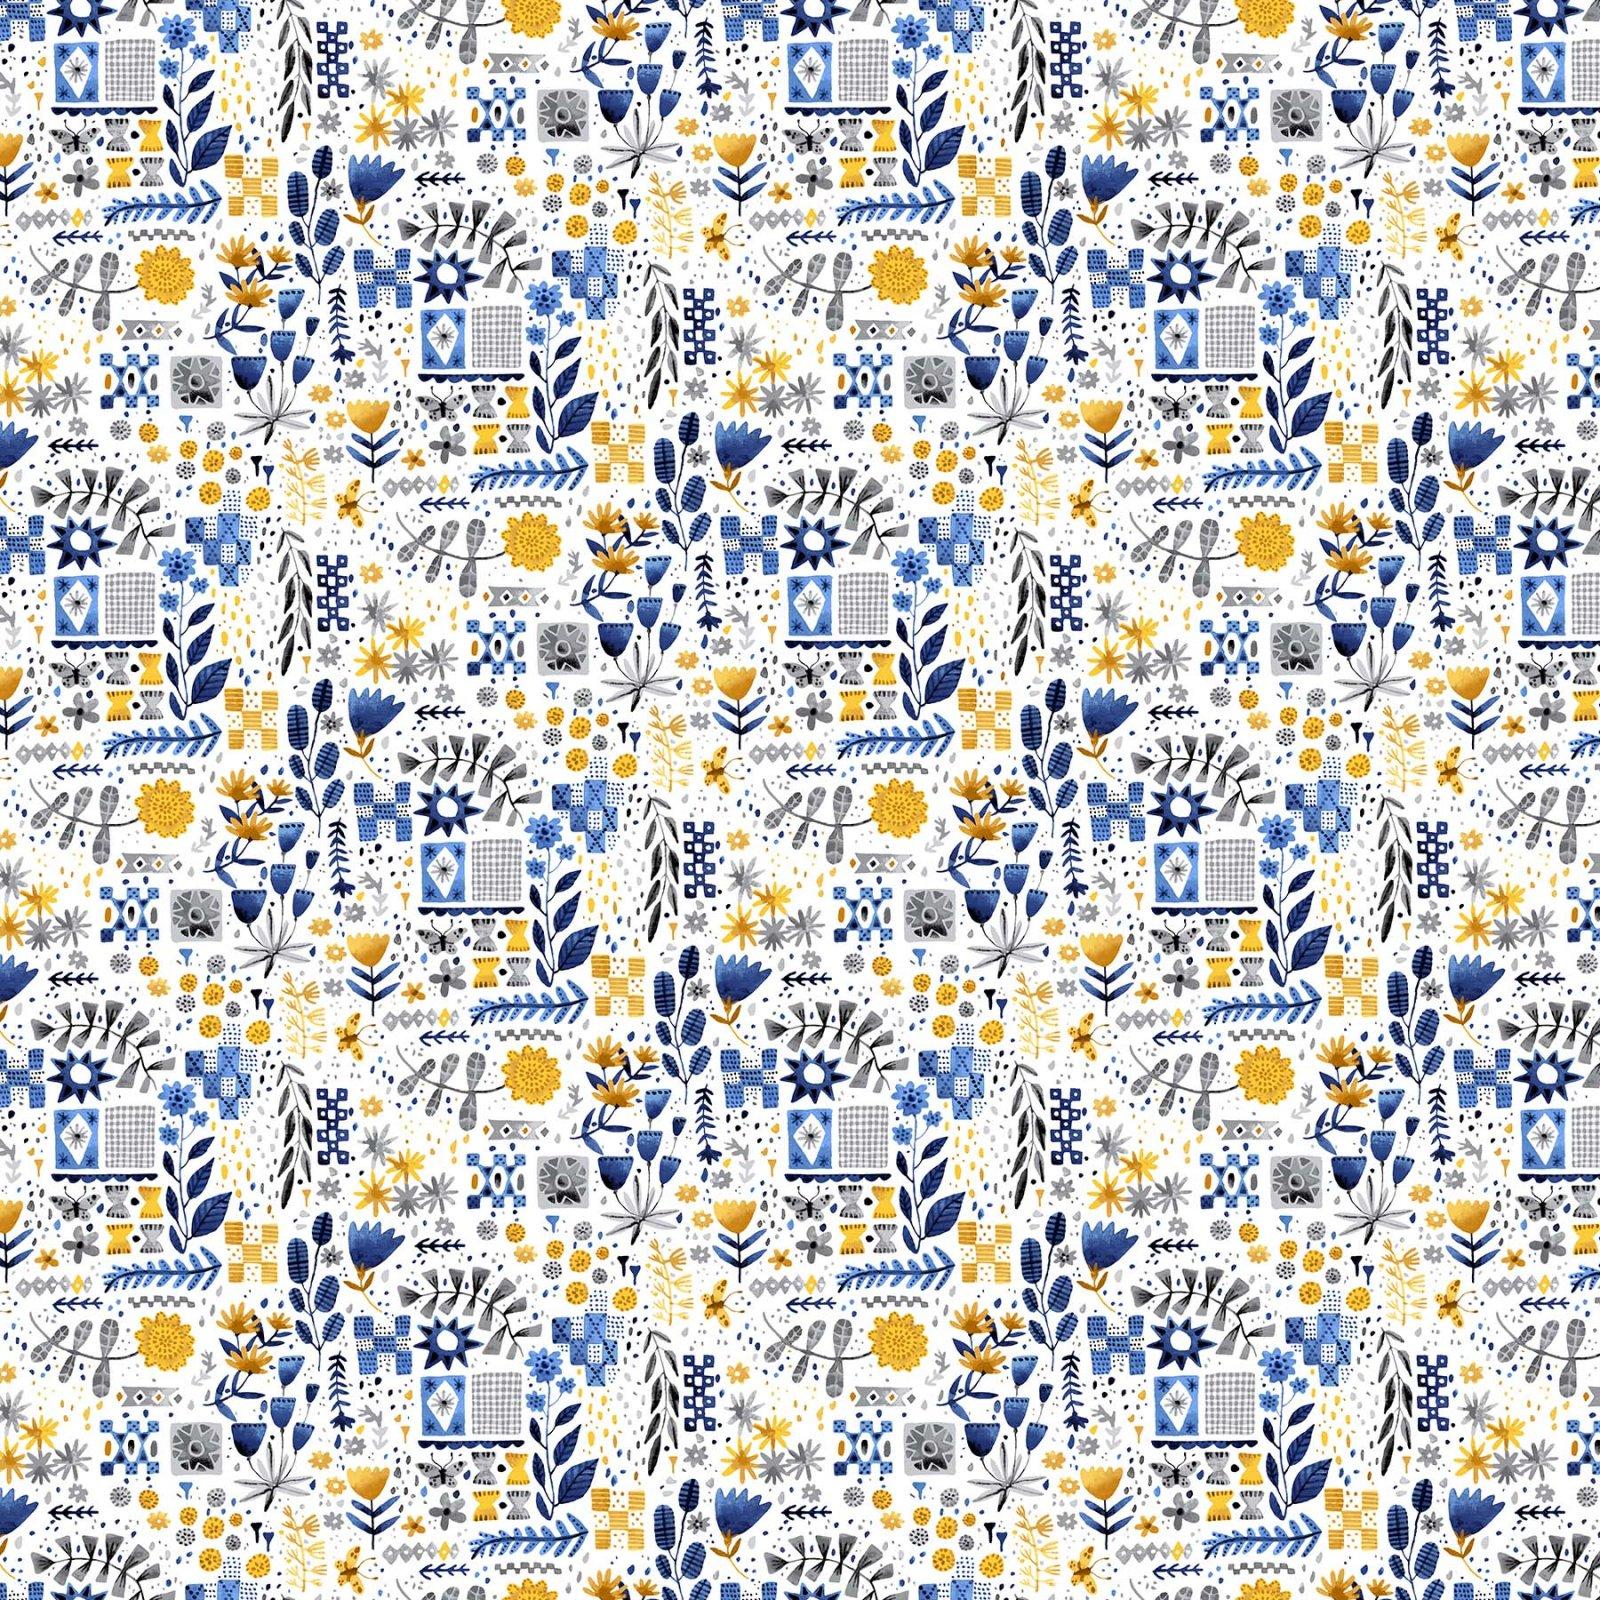 90031/52 Yellow White: Eloise's Garden (Abigail Halpin)